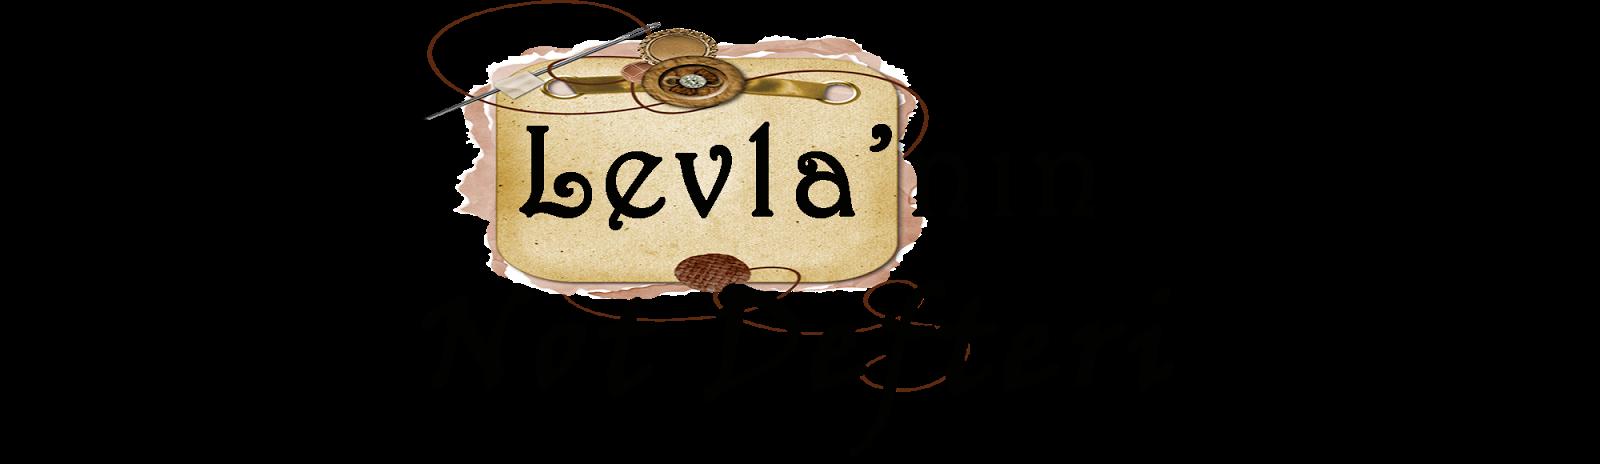 Levla'nın Not Defteri Logo